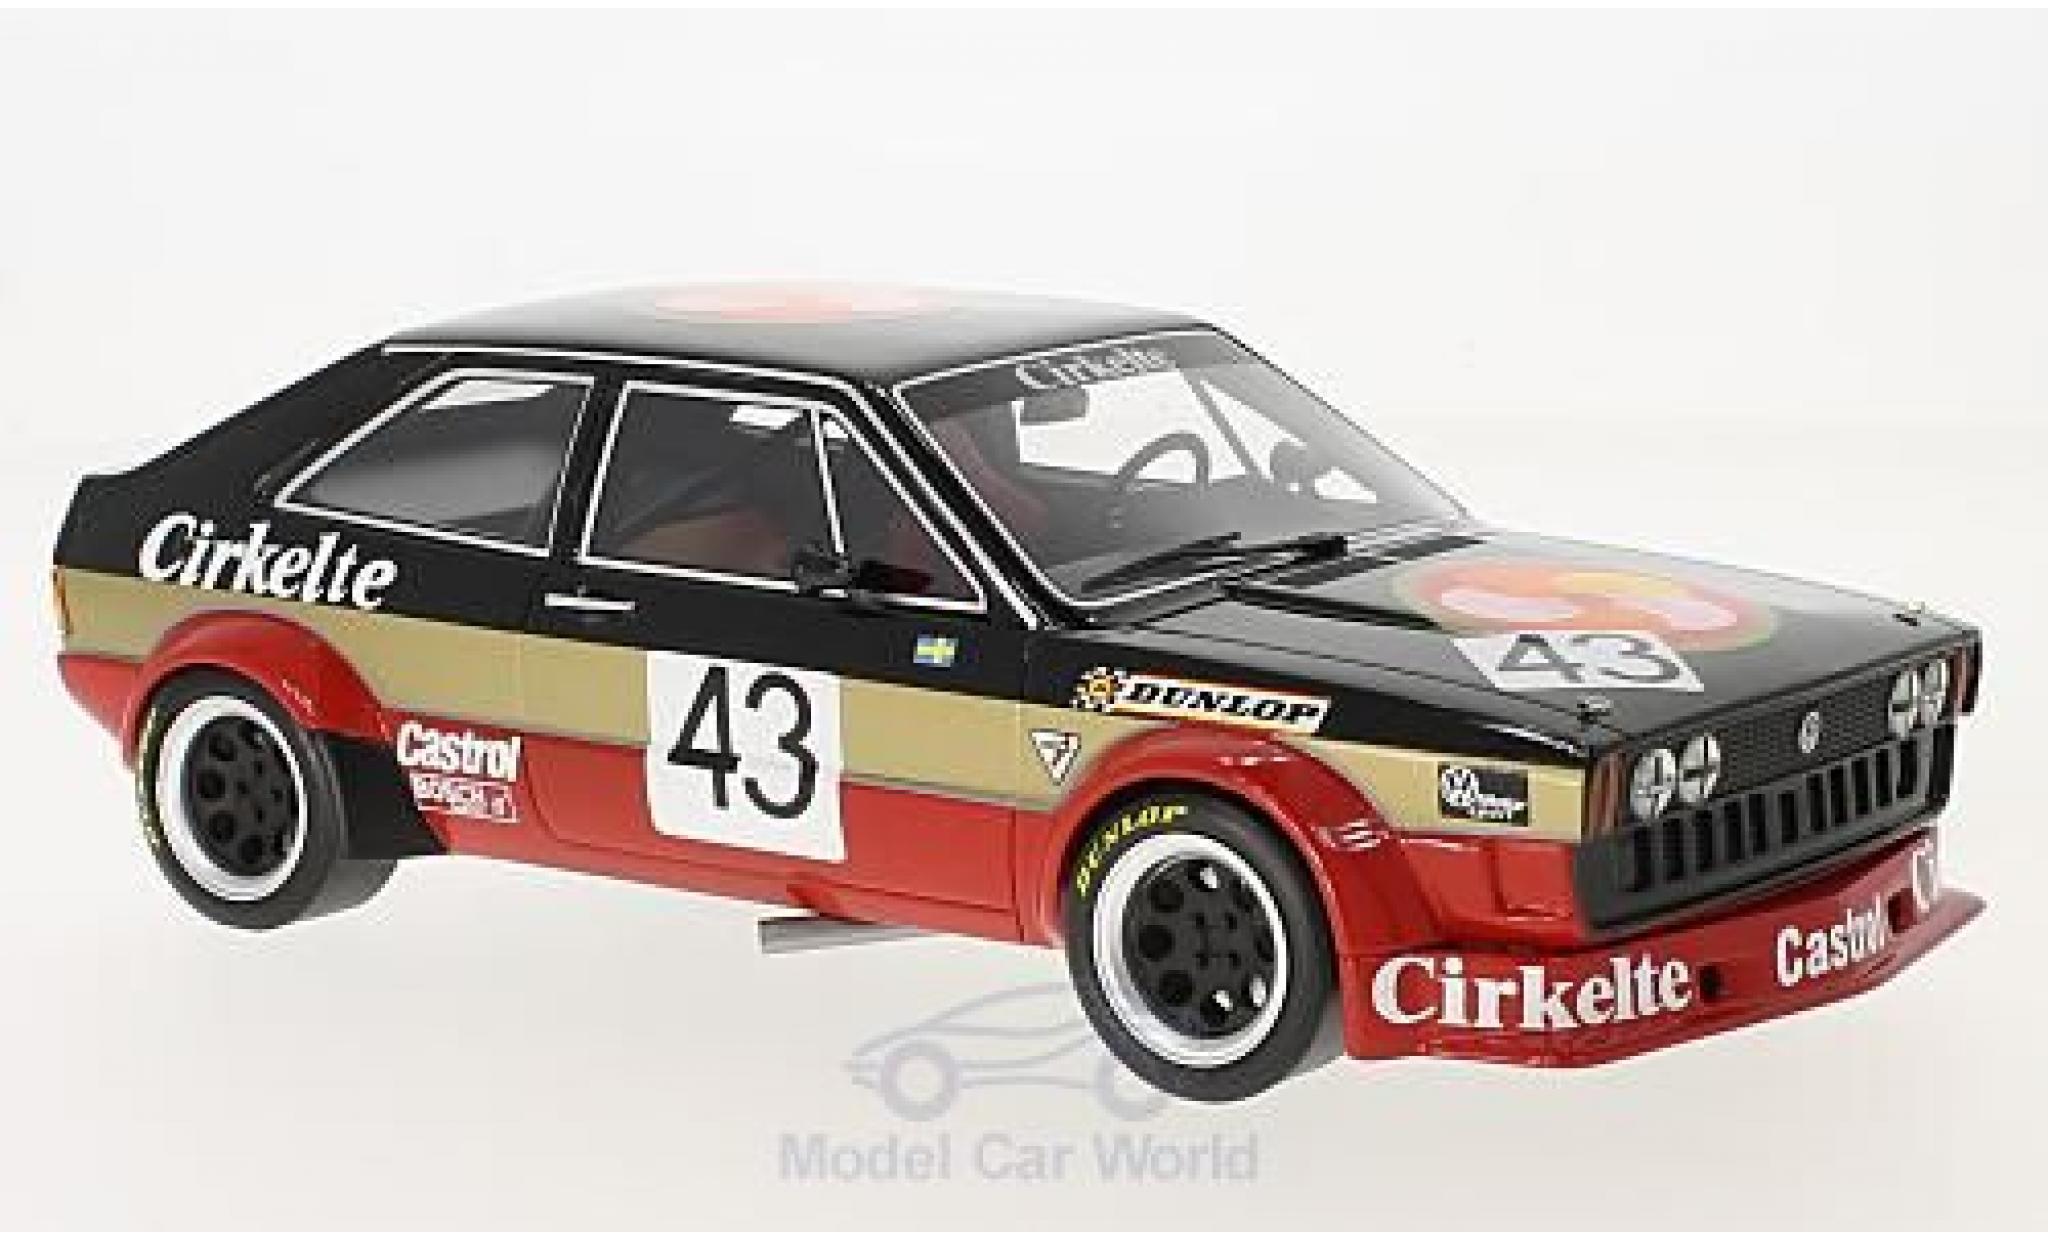 Volkswagen Scirocco 1/18 BoS Models I Gr.2 No.43 TL Racing AB Cirkelte ETCC 1979 Lindström/Wiedesheim